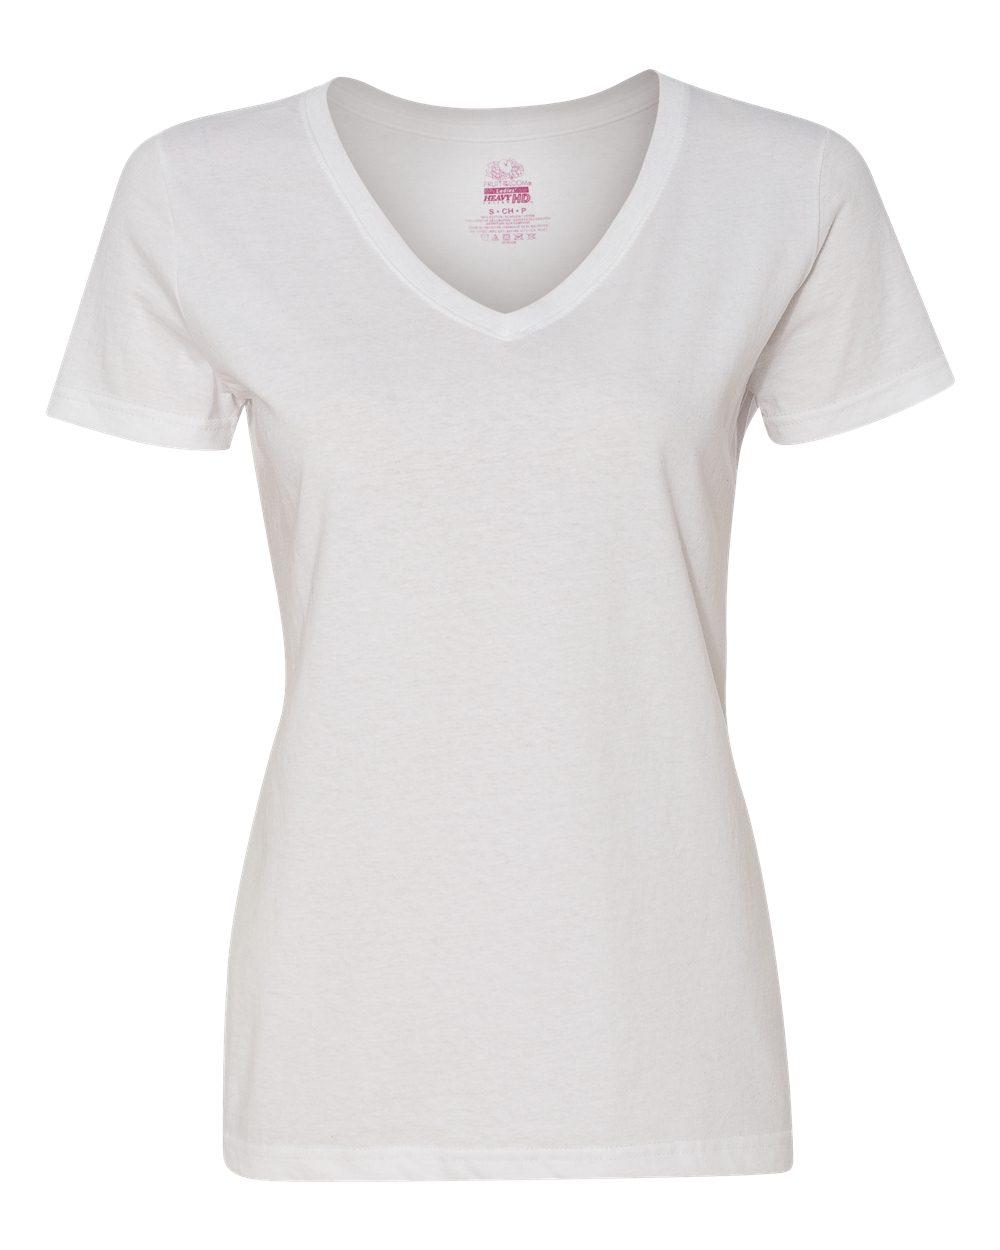 ba92564e Fruit of the Loom L39VR - Ladies' Heavy Cotton HD™ V-Neck T-Shirt